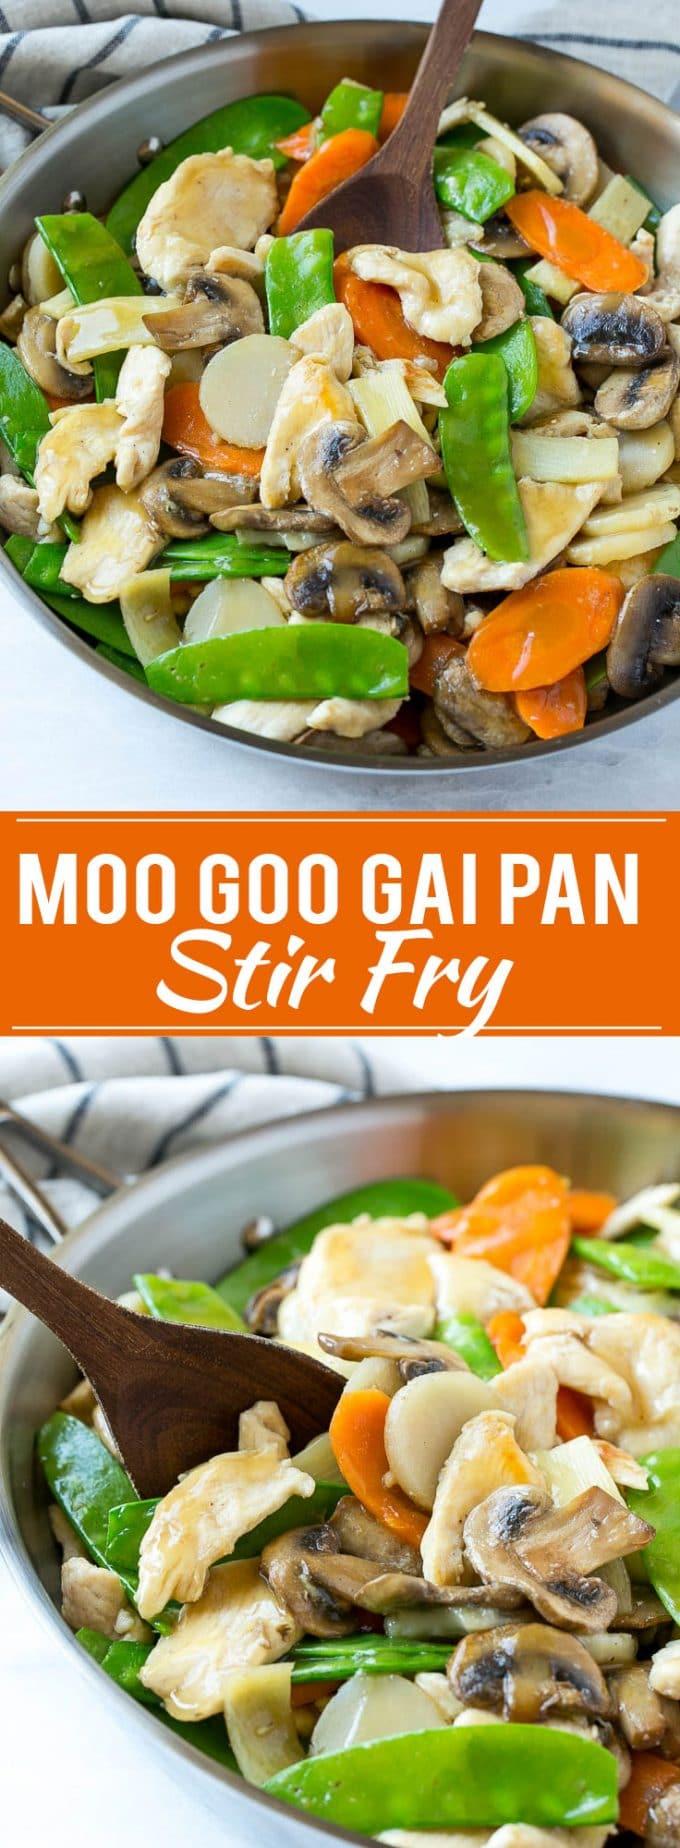 Moo Goo Gai Pan Recipe | Chicken Stir Fry | Chicken and Mushroom Stir Fry | Take Out | Chinese Food | Easy Chicken Recipe